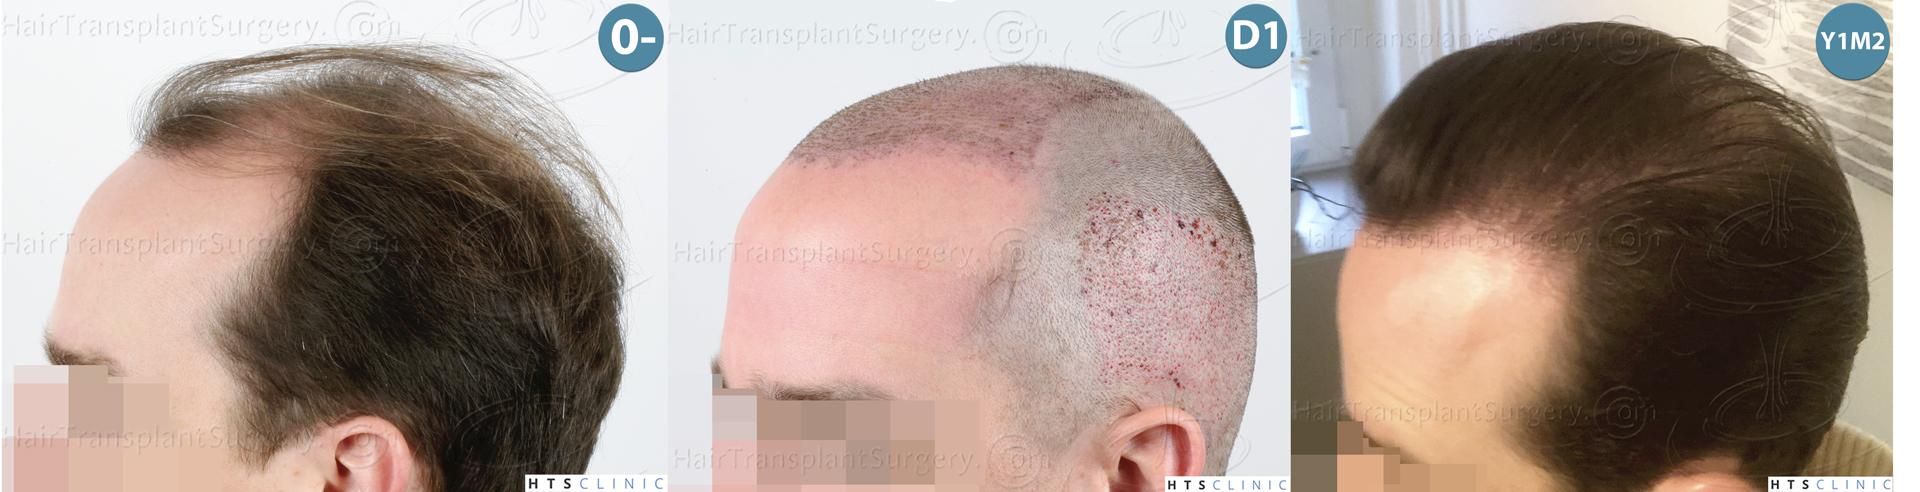 Dr.Devroye-HTS-Clinic-3878-FUE-NW-V-Montage-3.jpg